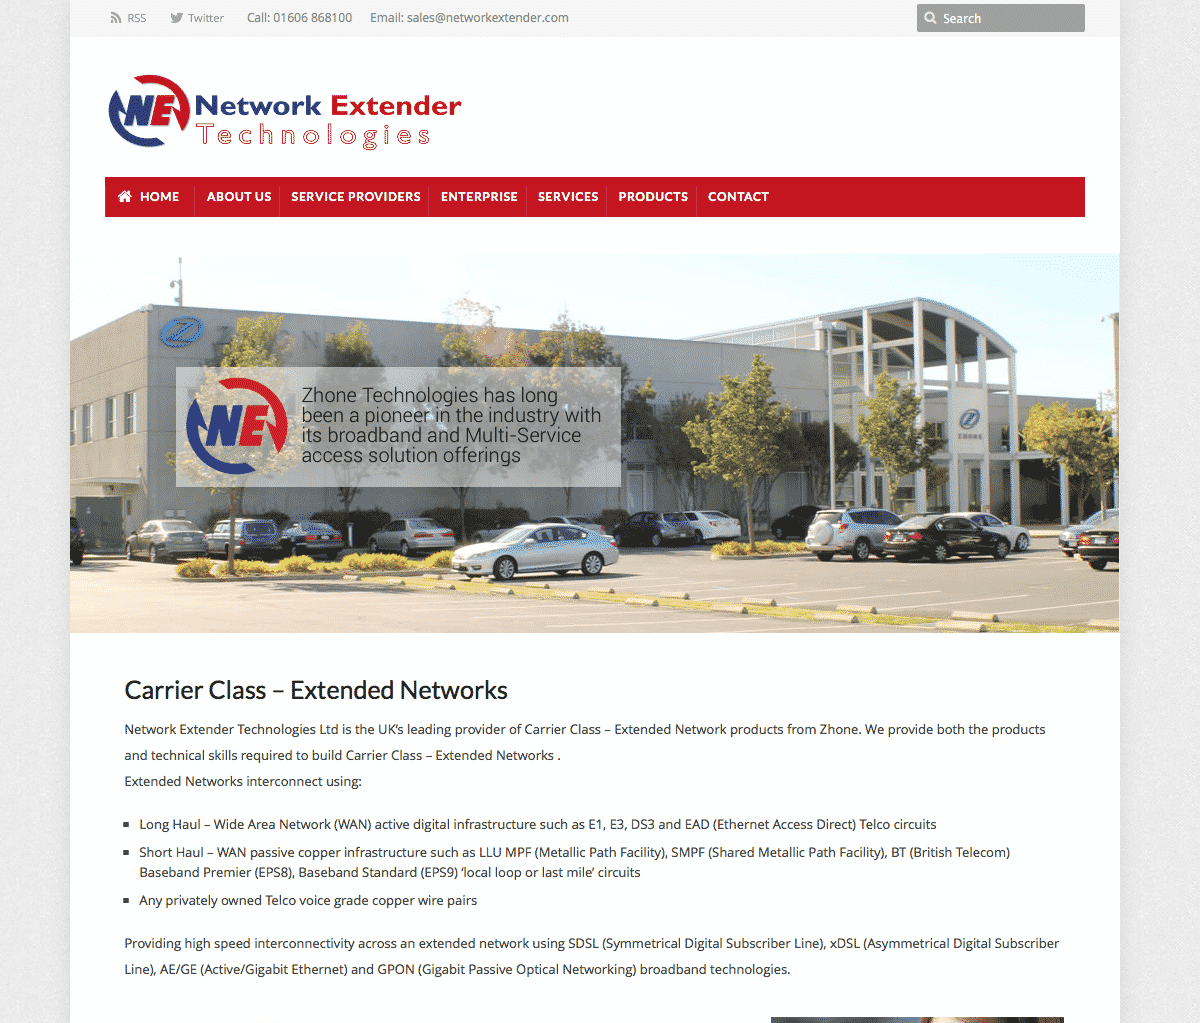 http://www.networkextender.com